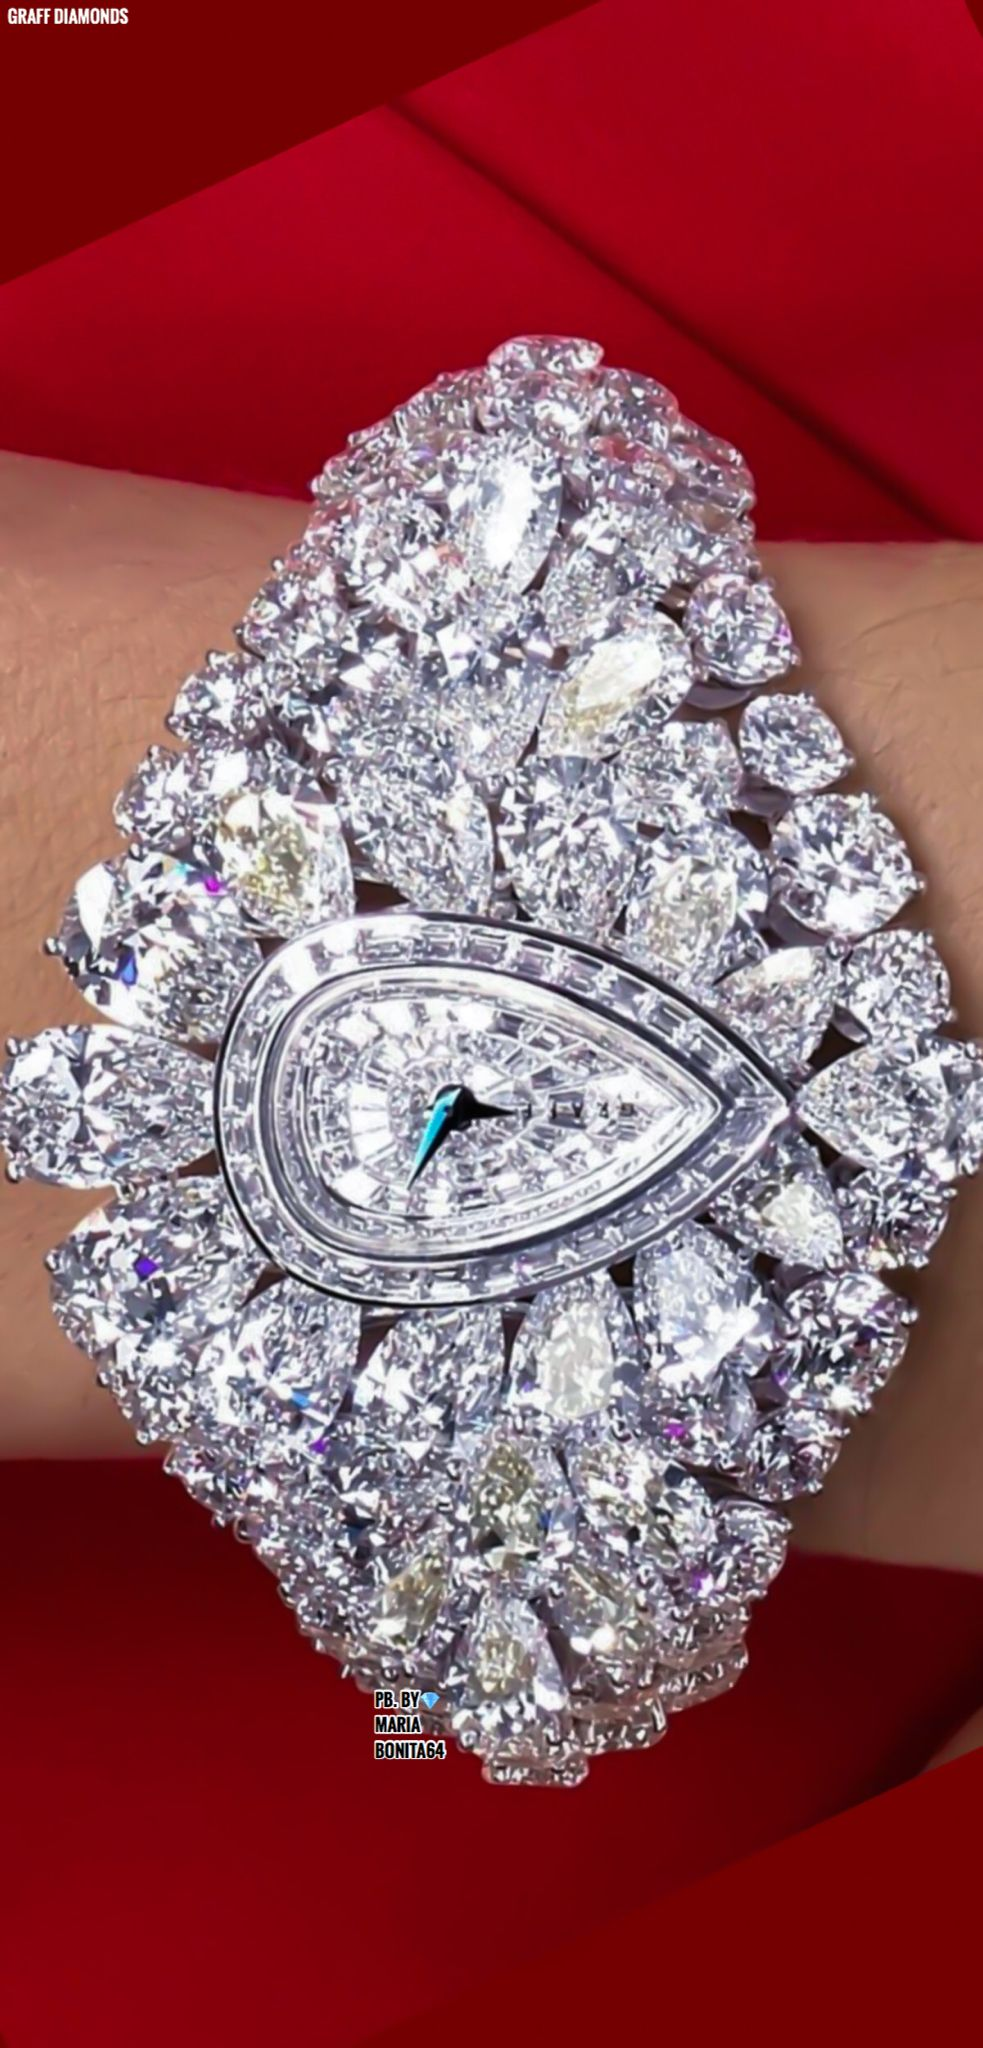 Graff Diamonds the Fascination at 40 Million Dollars | Boutique jewelry, Jewelry, Graff diamonds